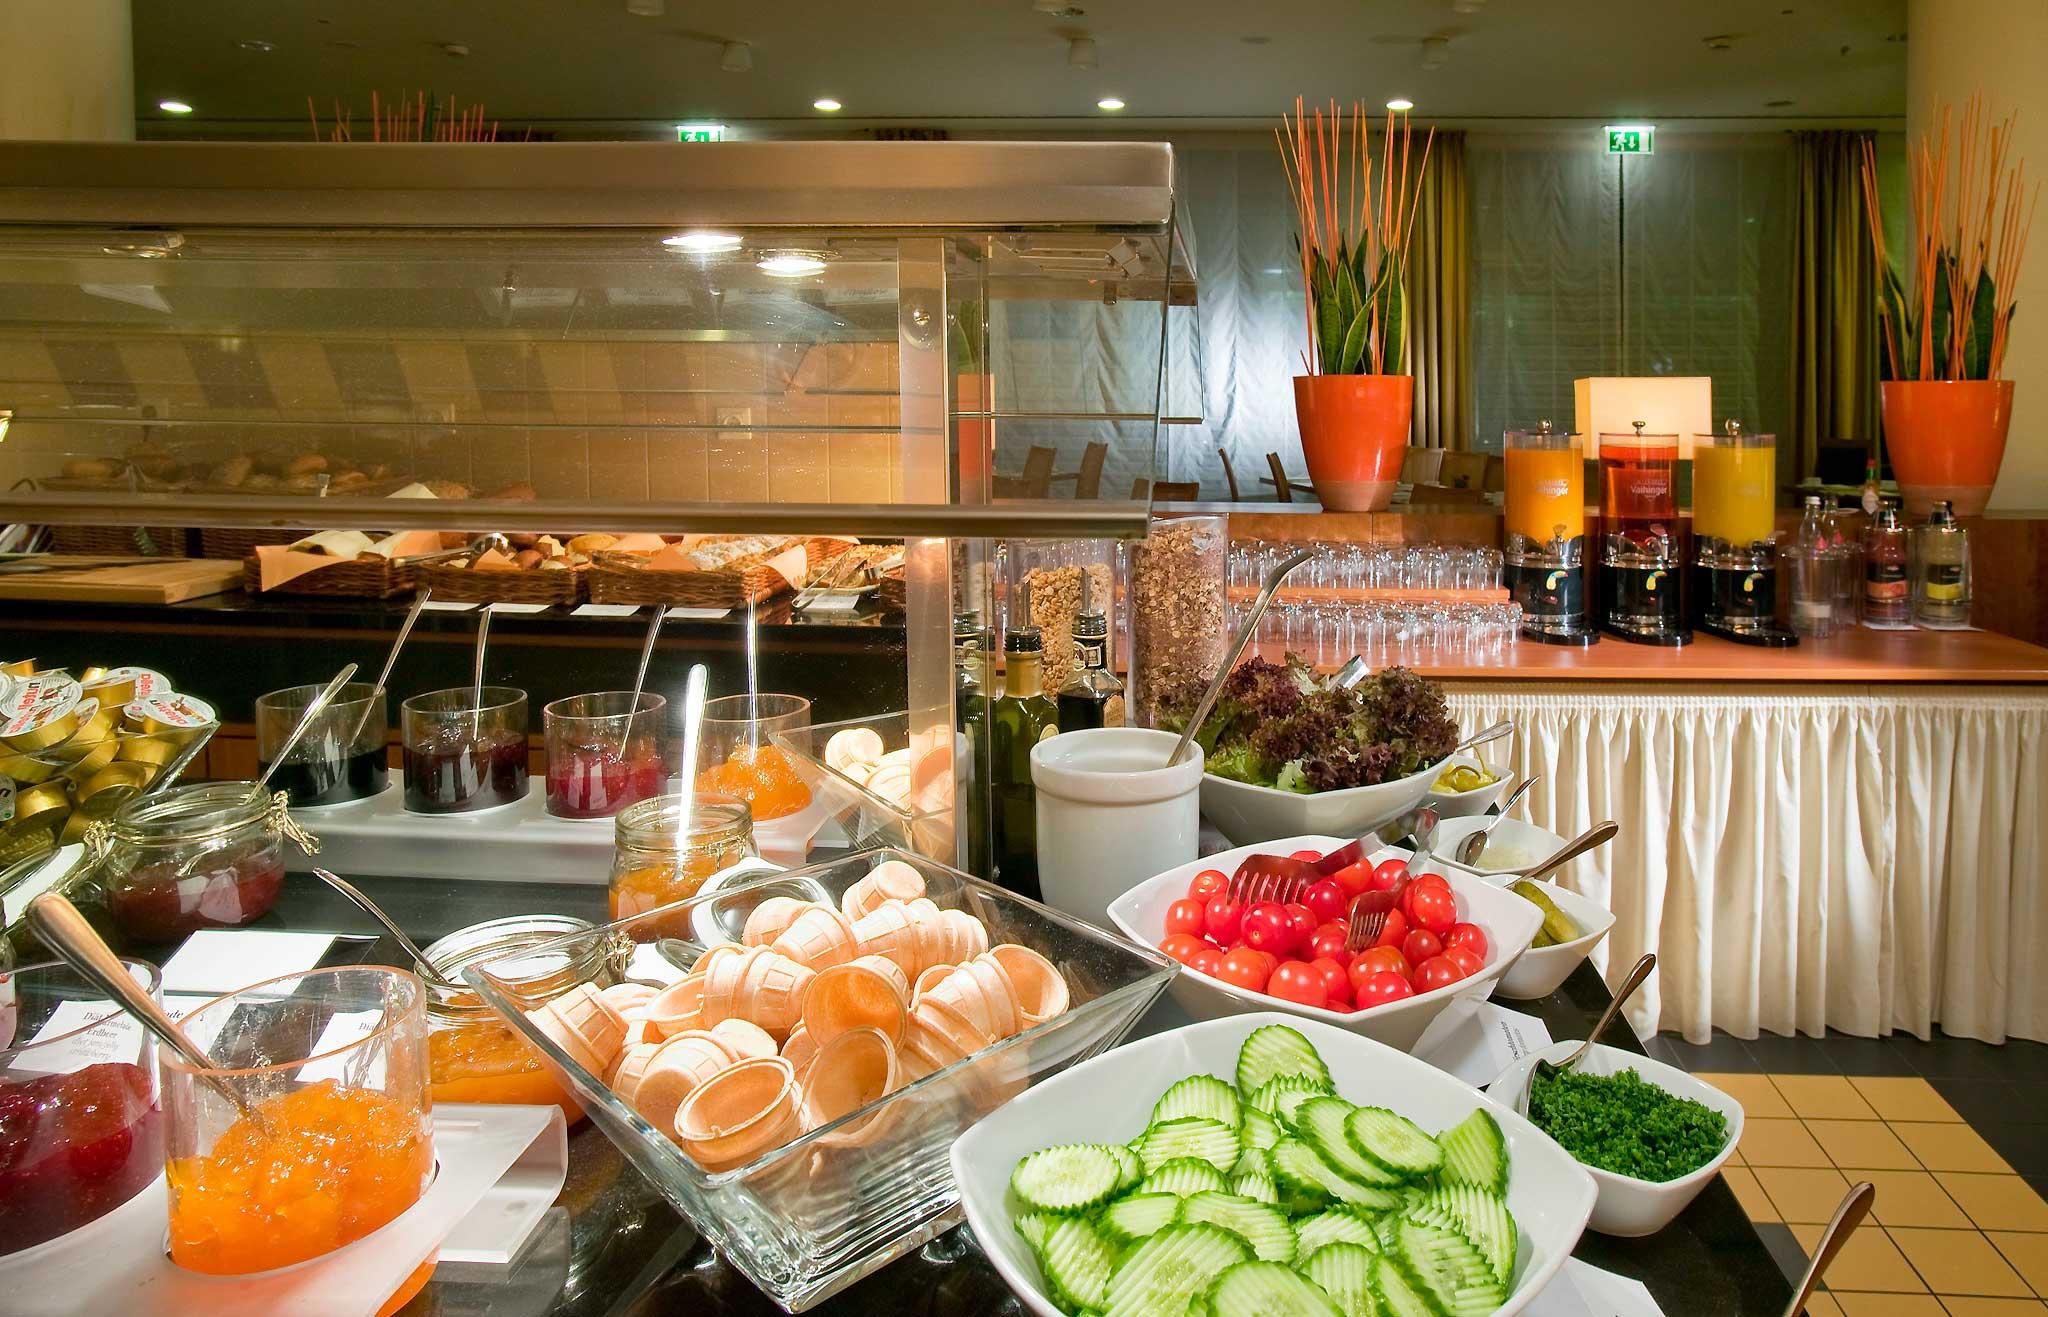 Novotel Erlangen Gastronomi